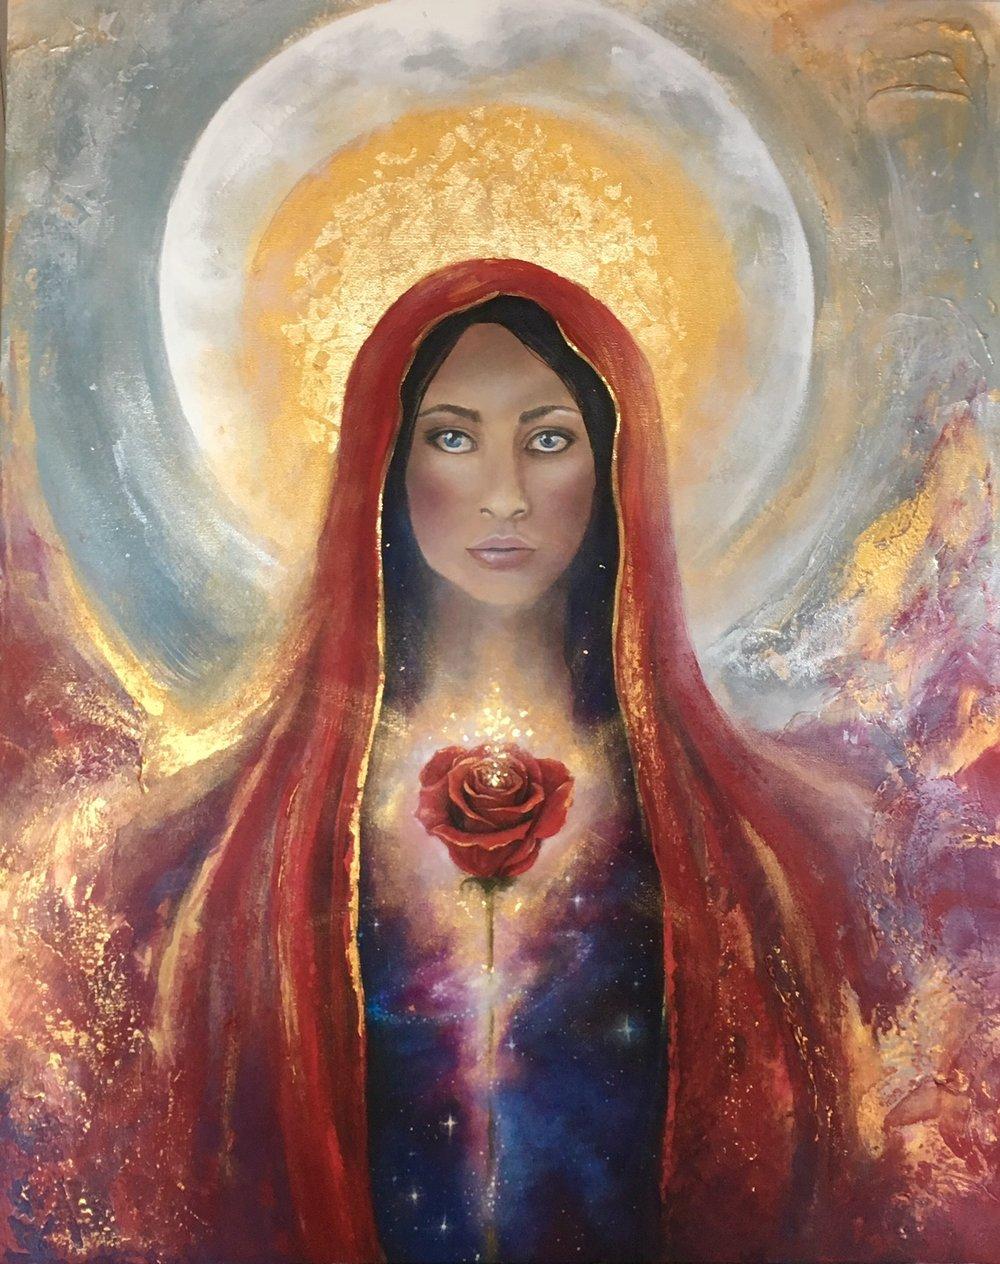 Artwork by Goddess Rising Moon Priestess Sister, Linzy Arnott